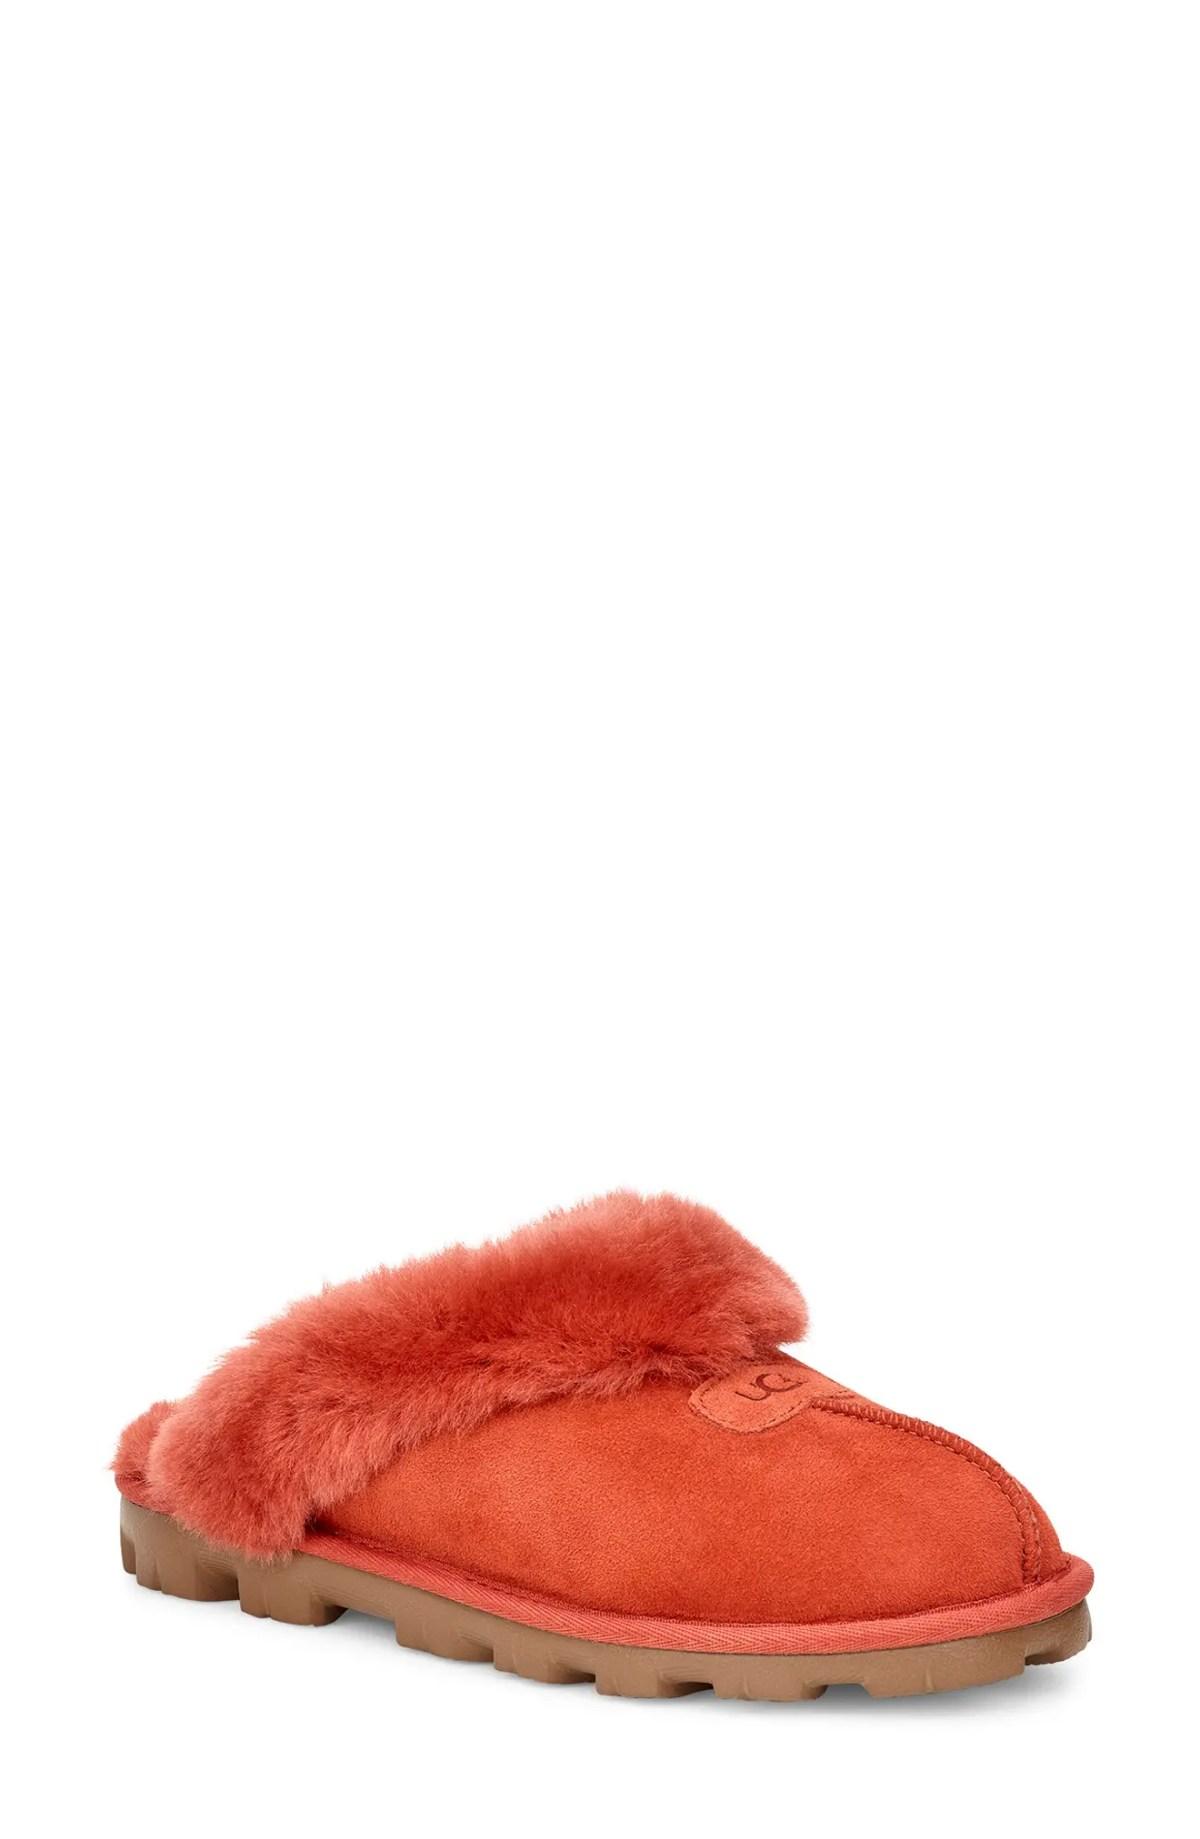 UGG<SUP>®</SUP> Genuine Shearling Slipper, Main, color, TERRACOTTA